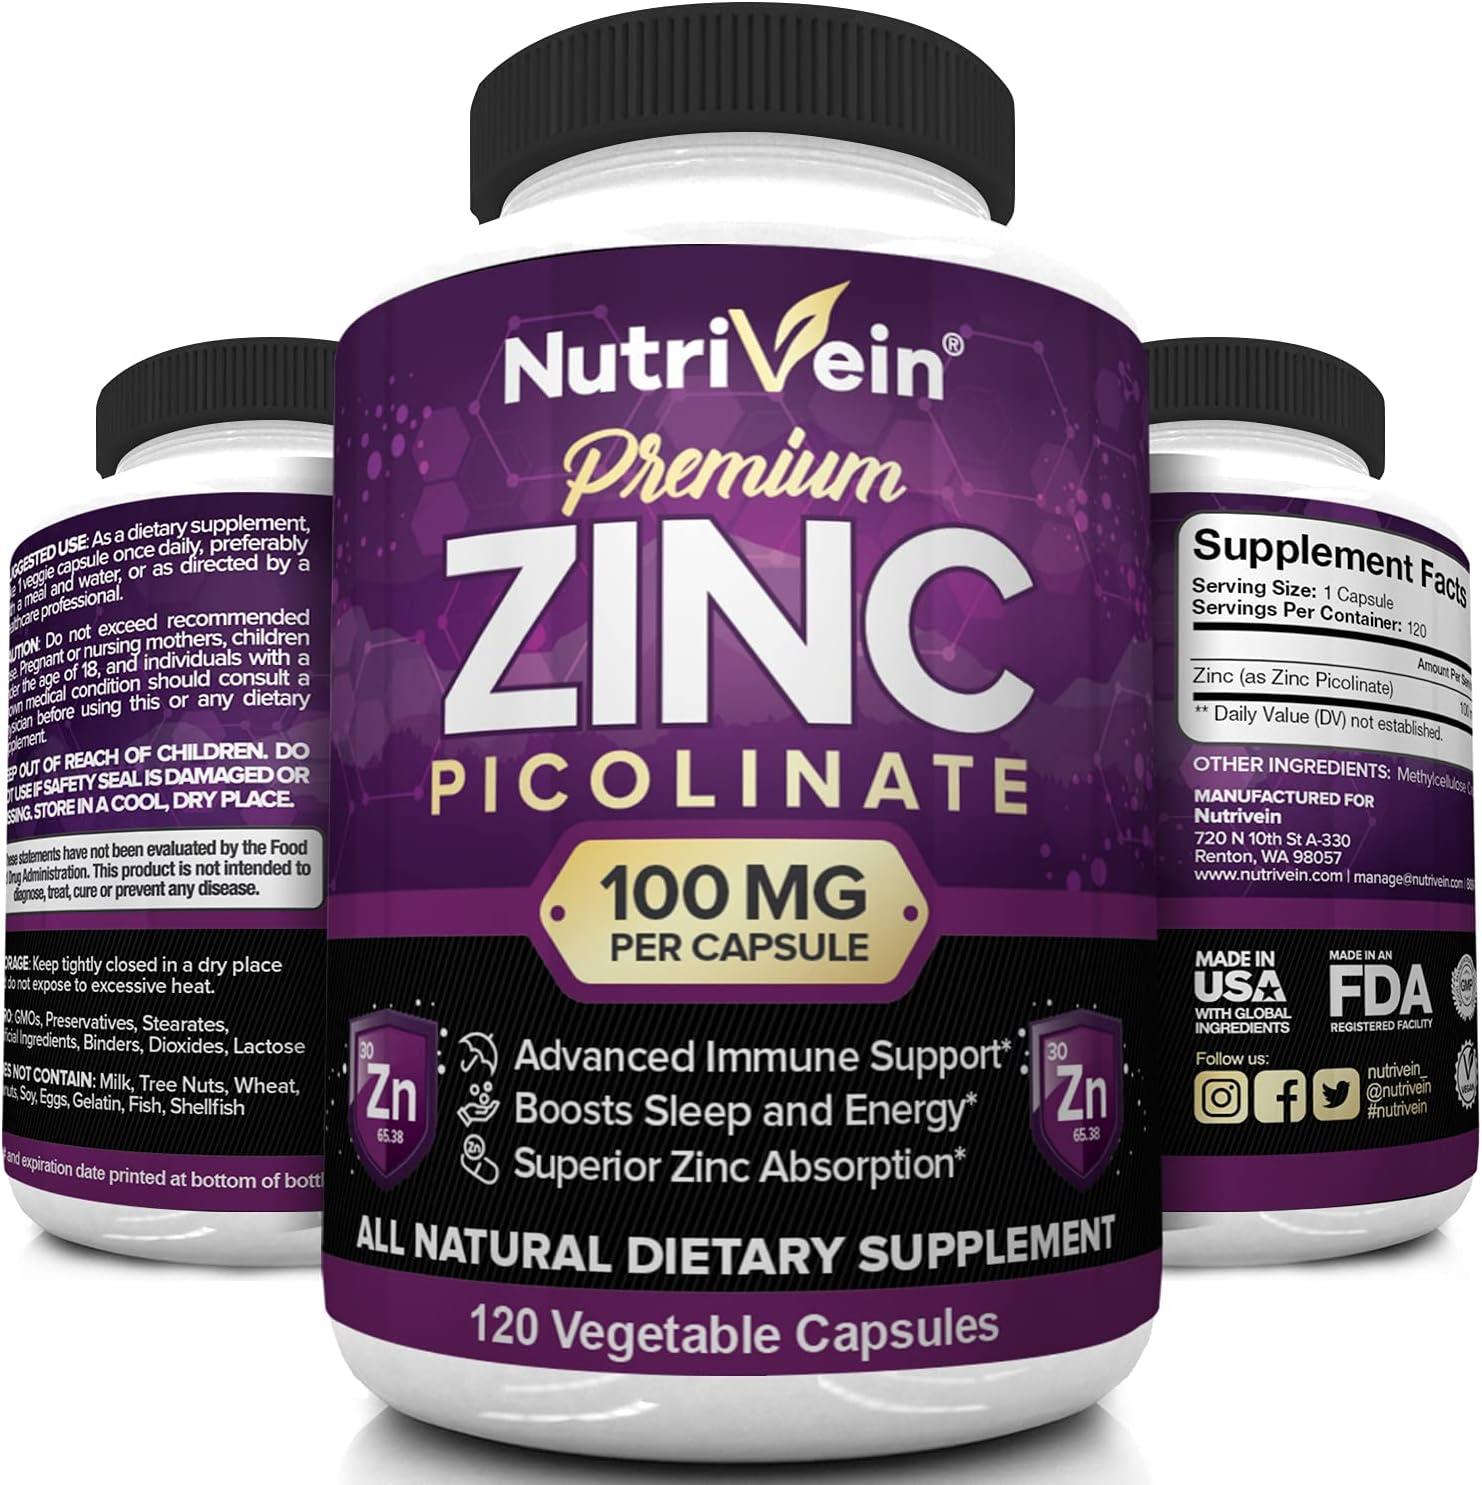 Nutrivein Premium Zinc Picolinate 100mg - 120 Capsules - Immunity Defense Boosts Immune System & Cellular Regeneration - Maximum Strength Bioavailable Supplement - Essential Elements for Absorption: Health & Personal Care